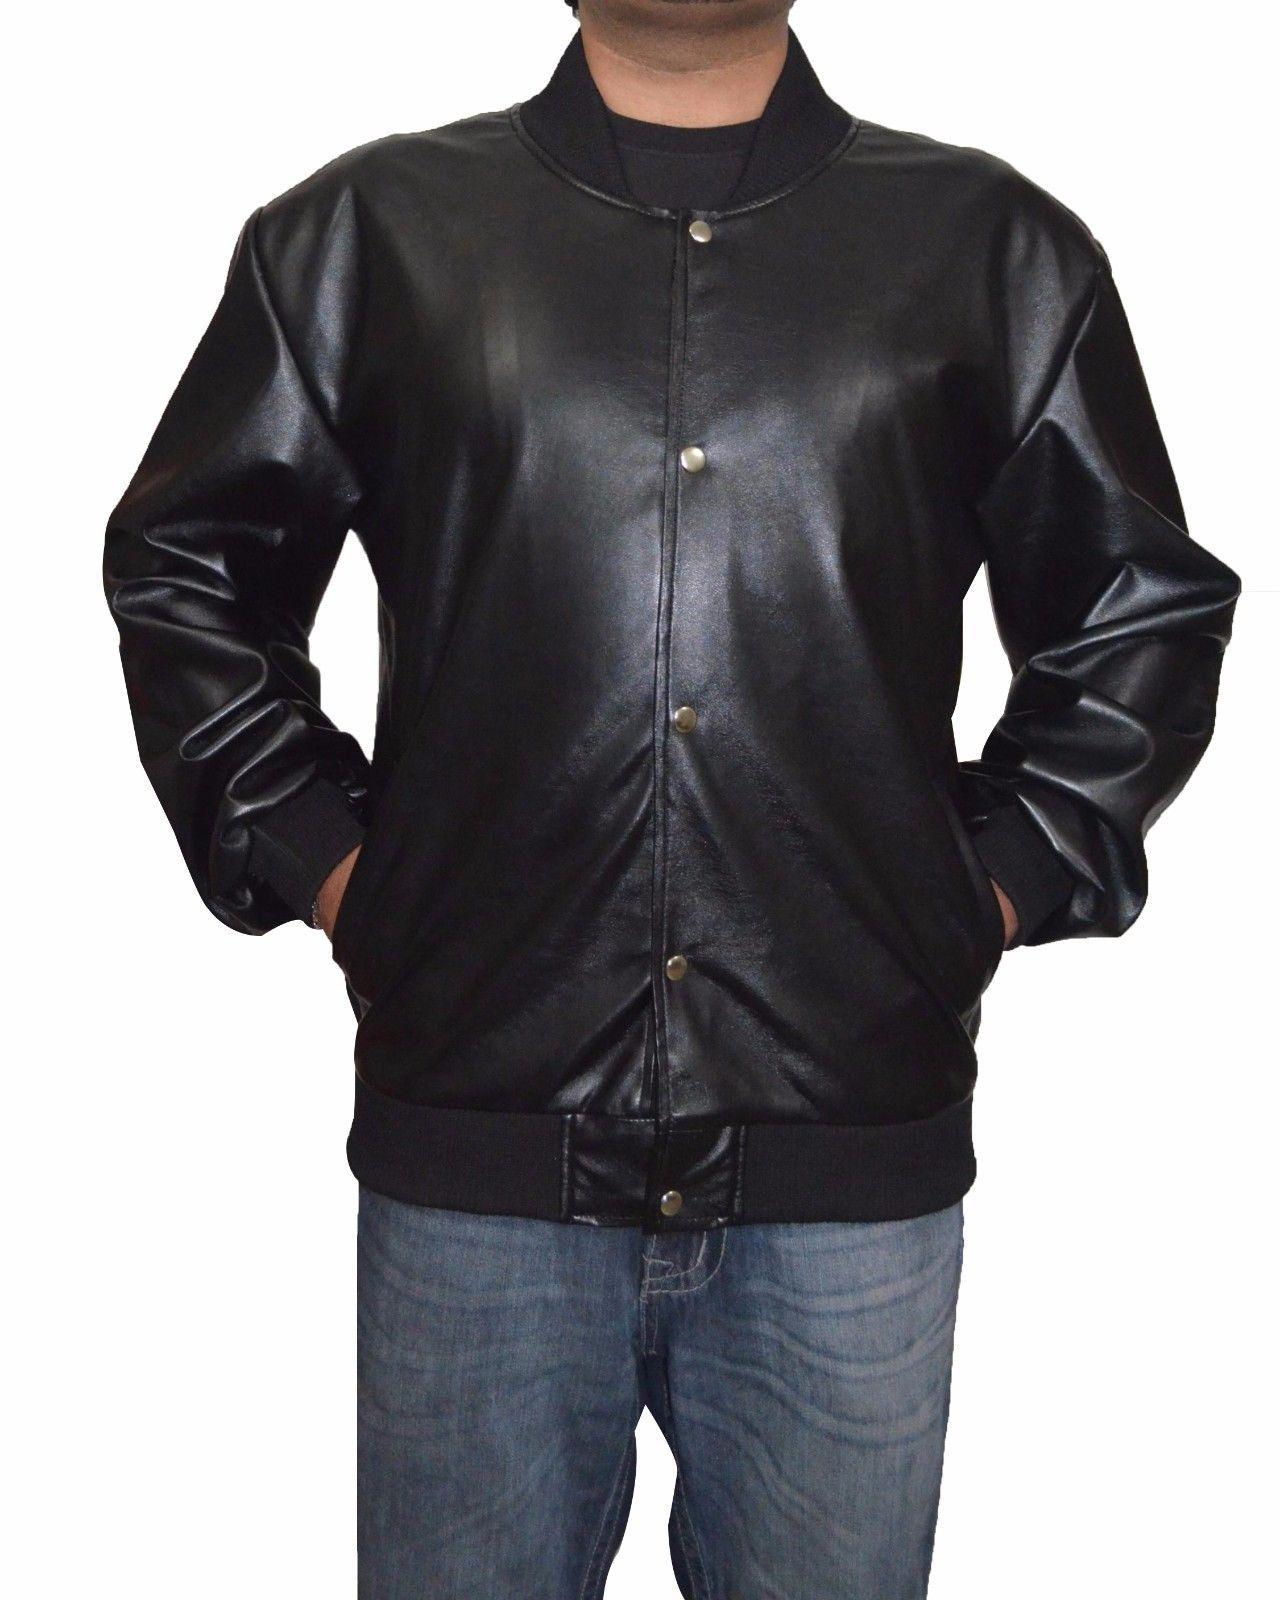 Men's Leather Jacket Handmade Black Motorcycle Solid Lambskin Leather Coat-HWL9